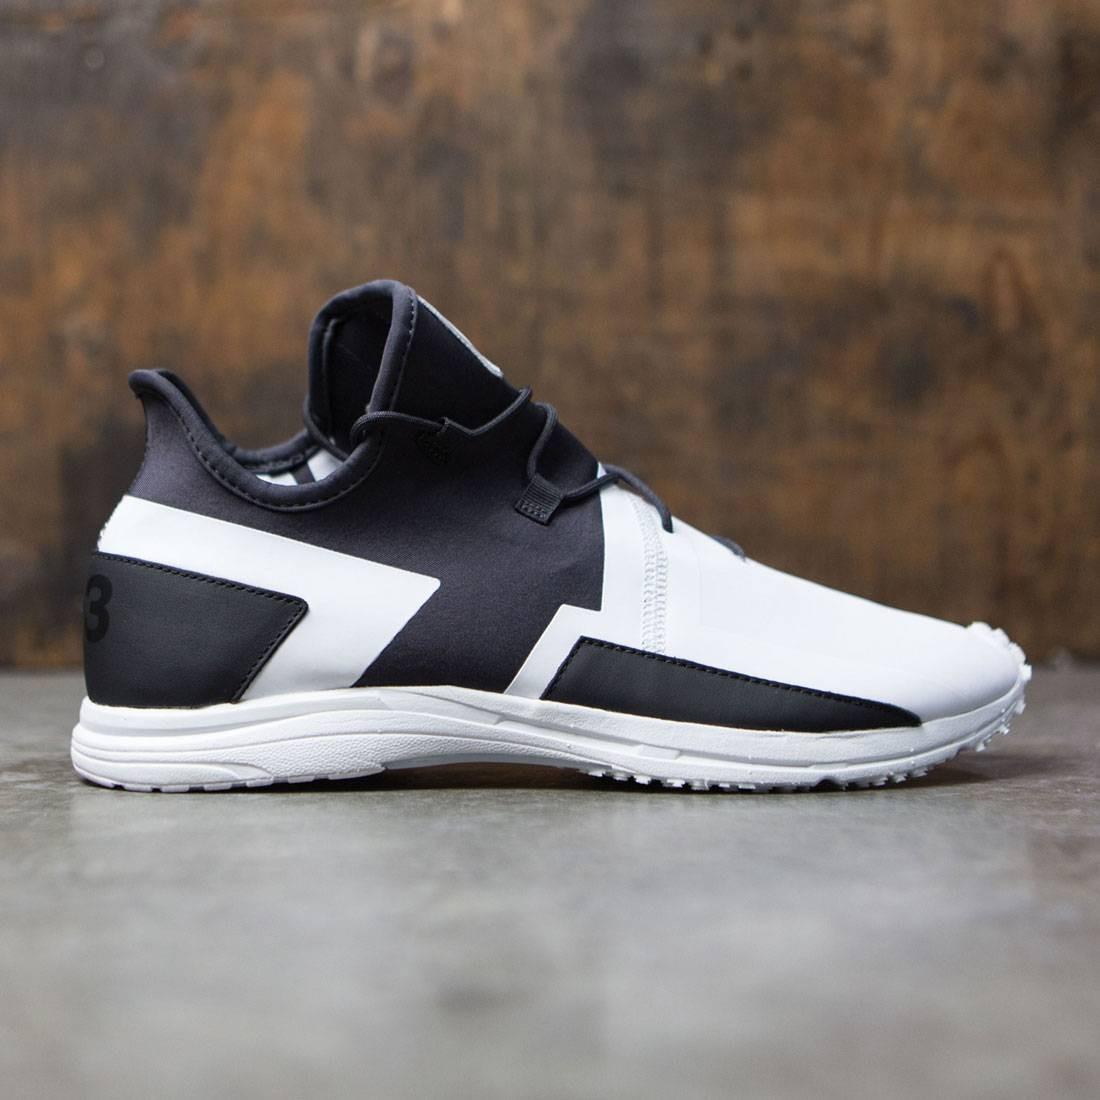 612c65087671c Adidas Y-3 Men Arc RC white utility black core black